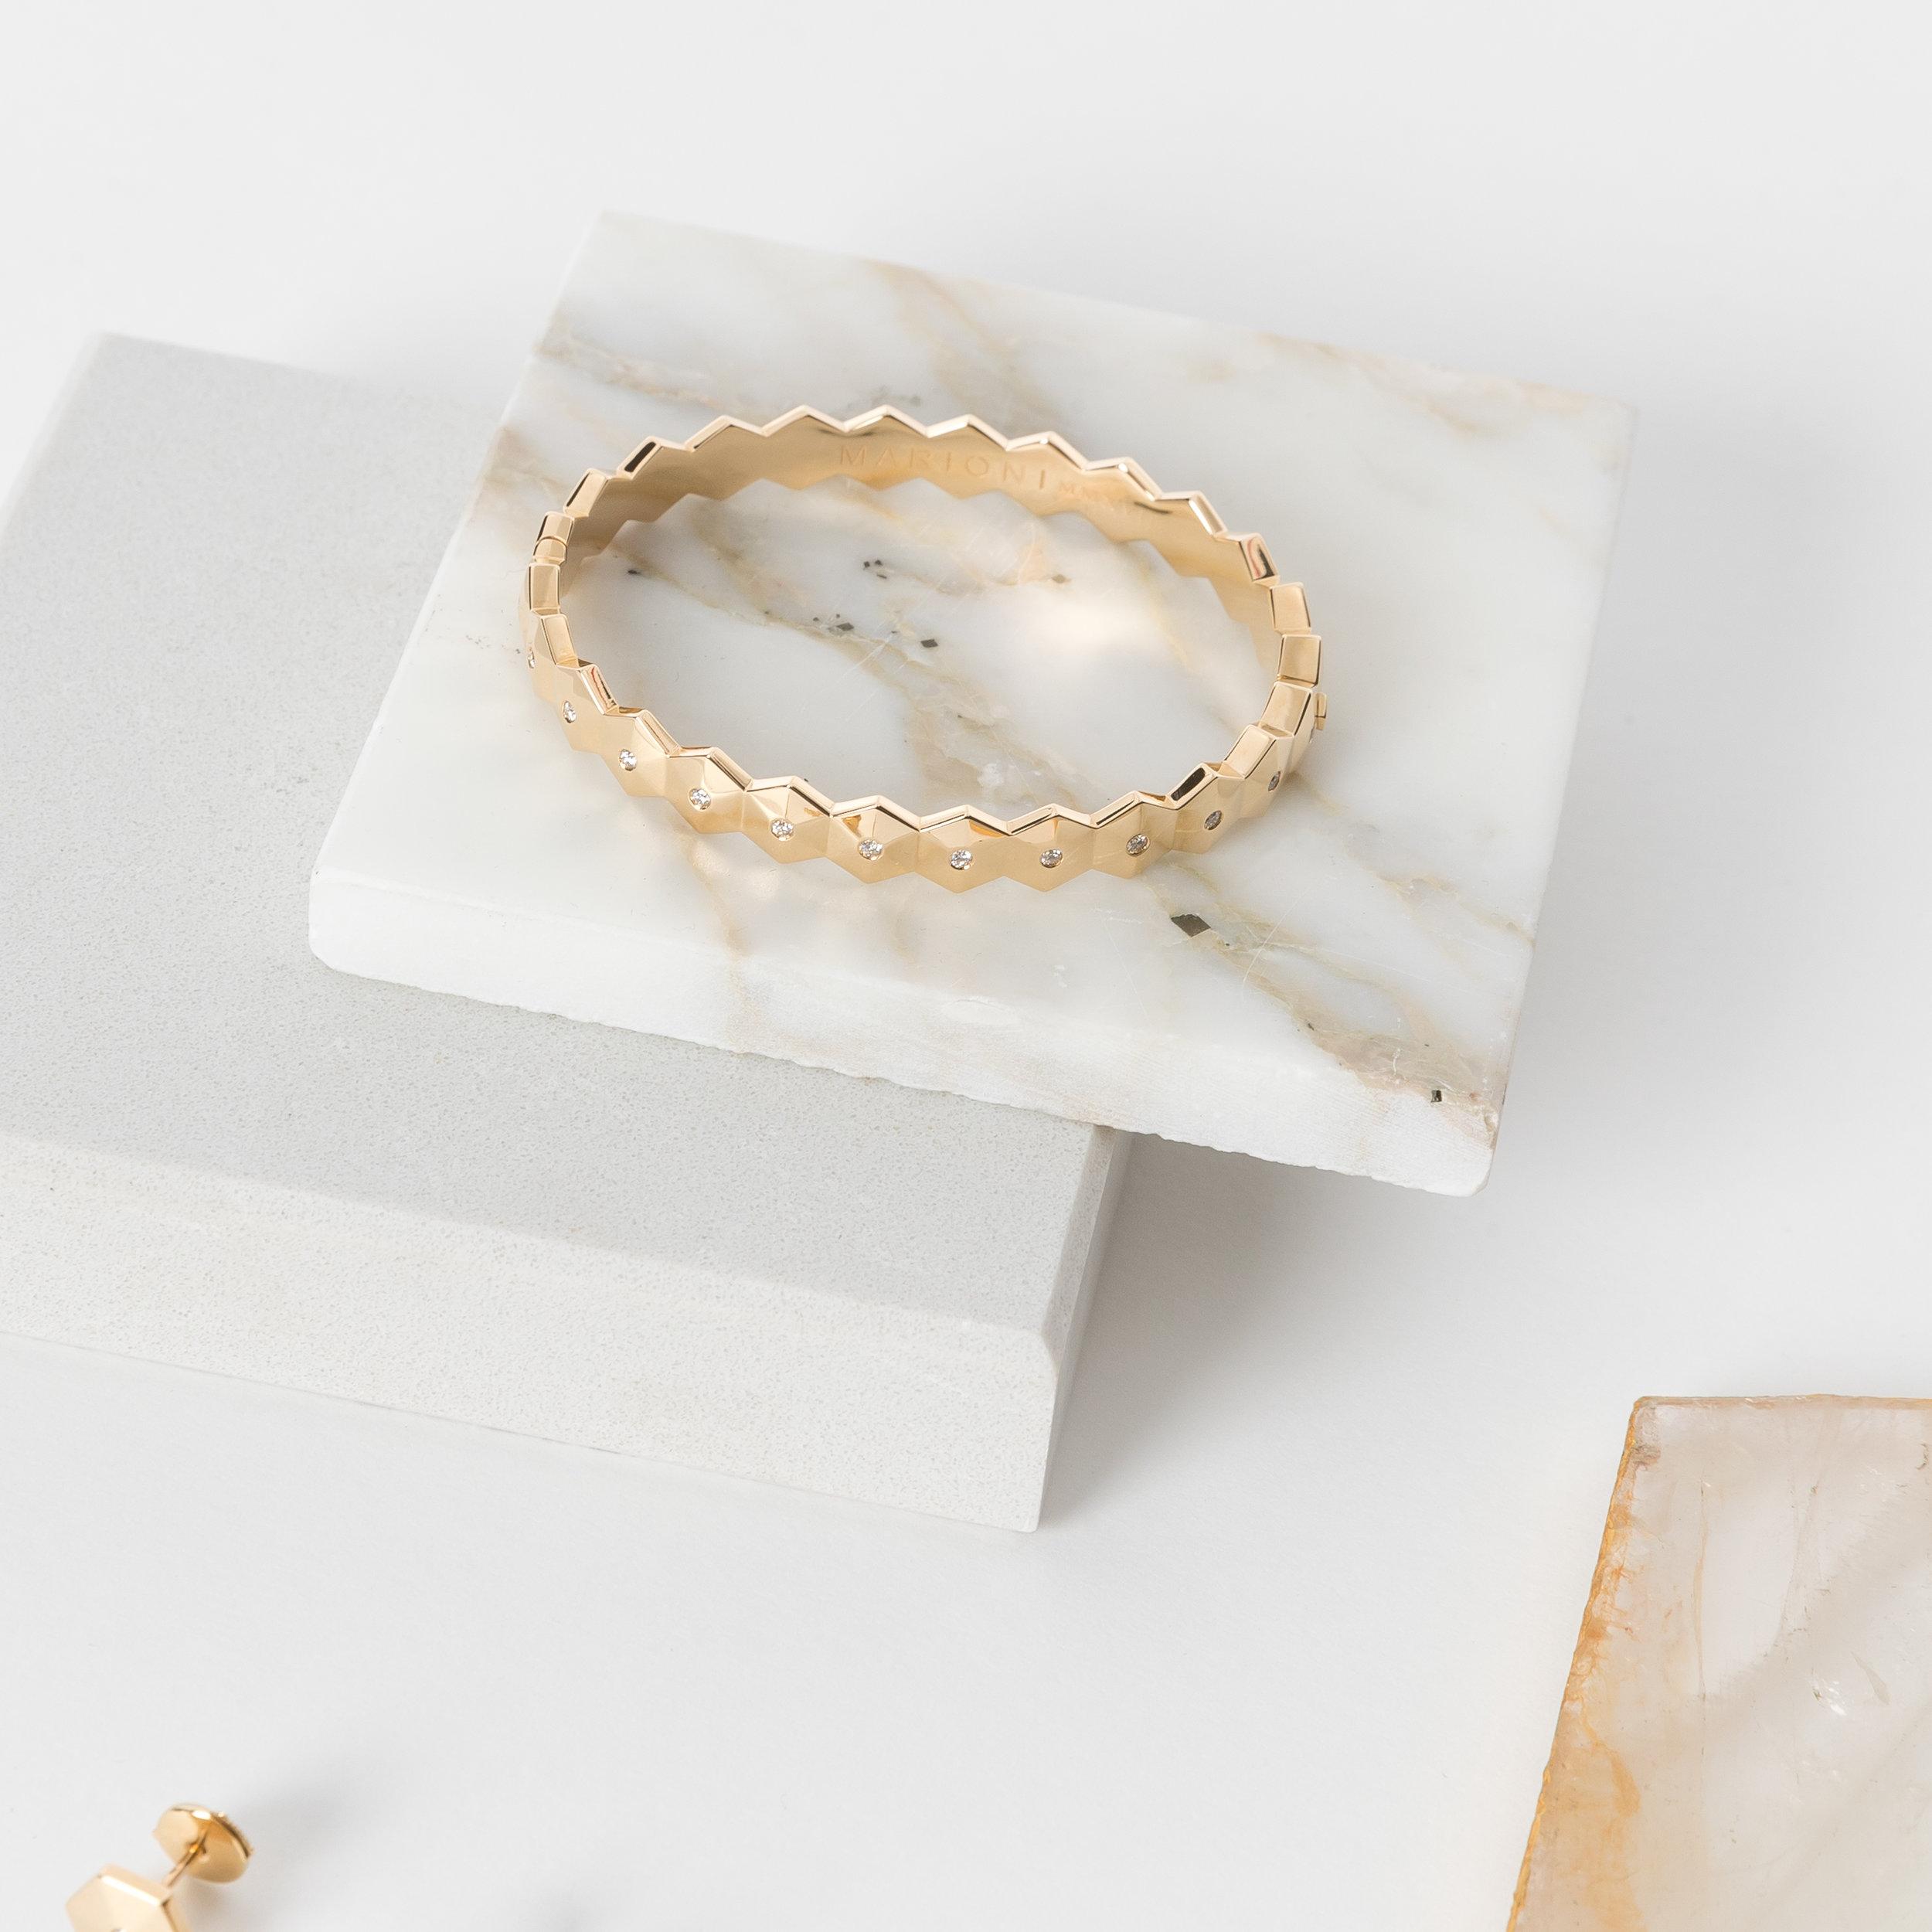 ABE1_Marioni_Jewelry_Studio_Flatlays-3.jpg